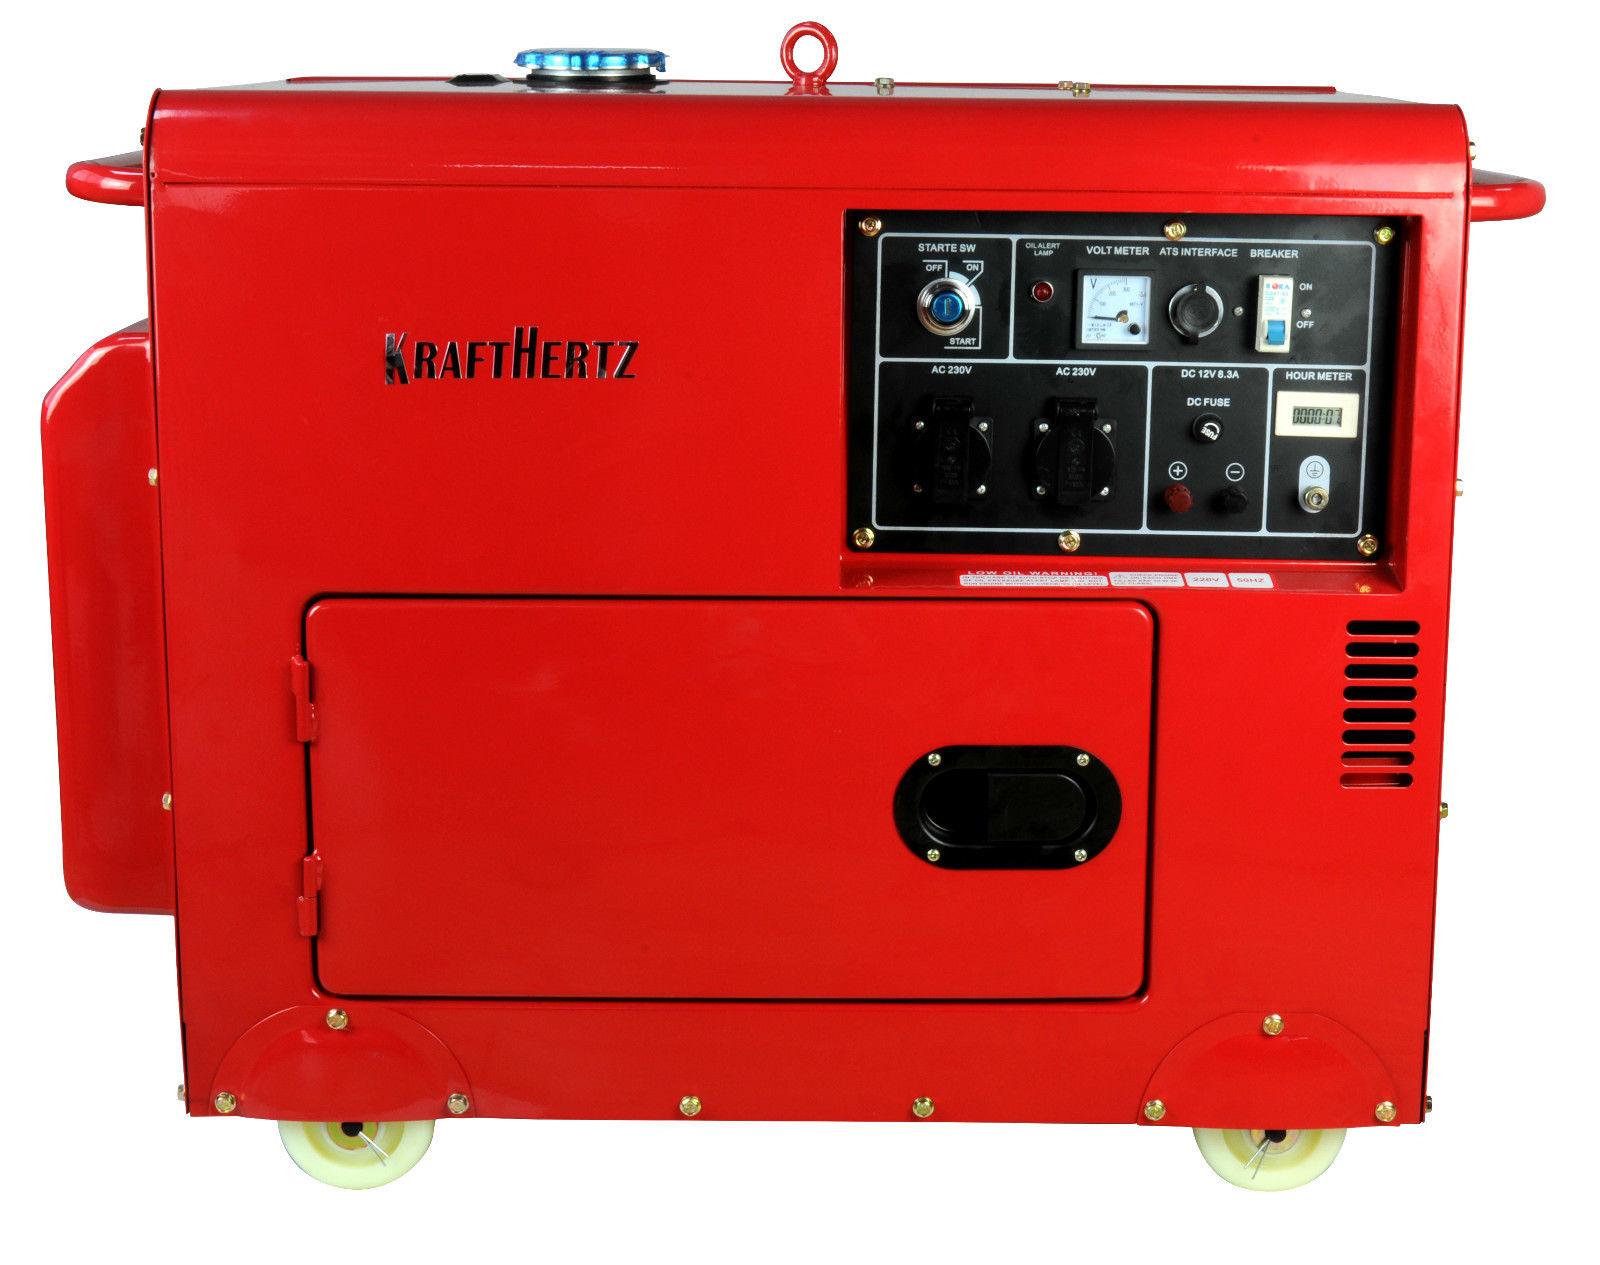 KH6600 Diesel Generator Germany Silent E Start ATS